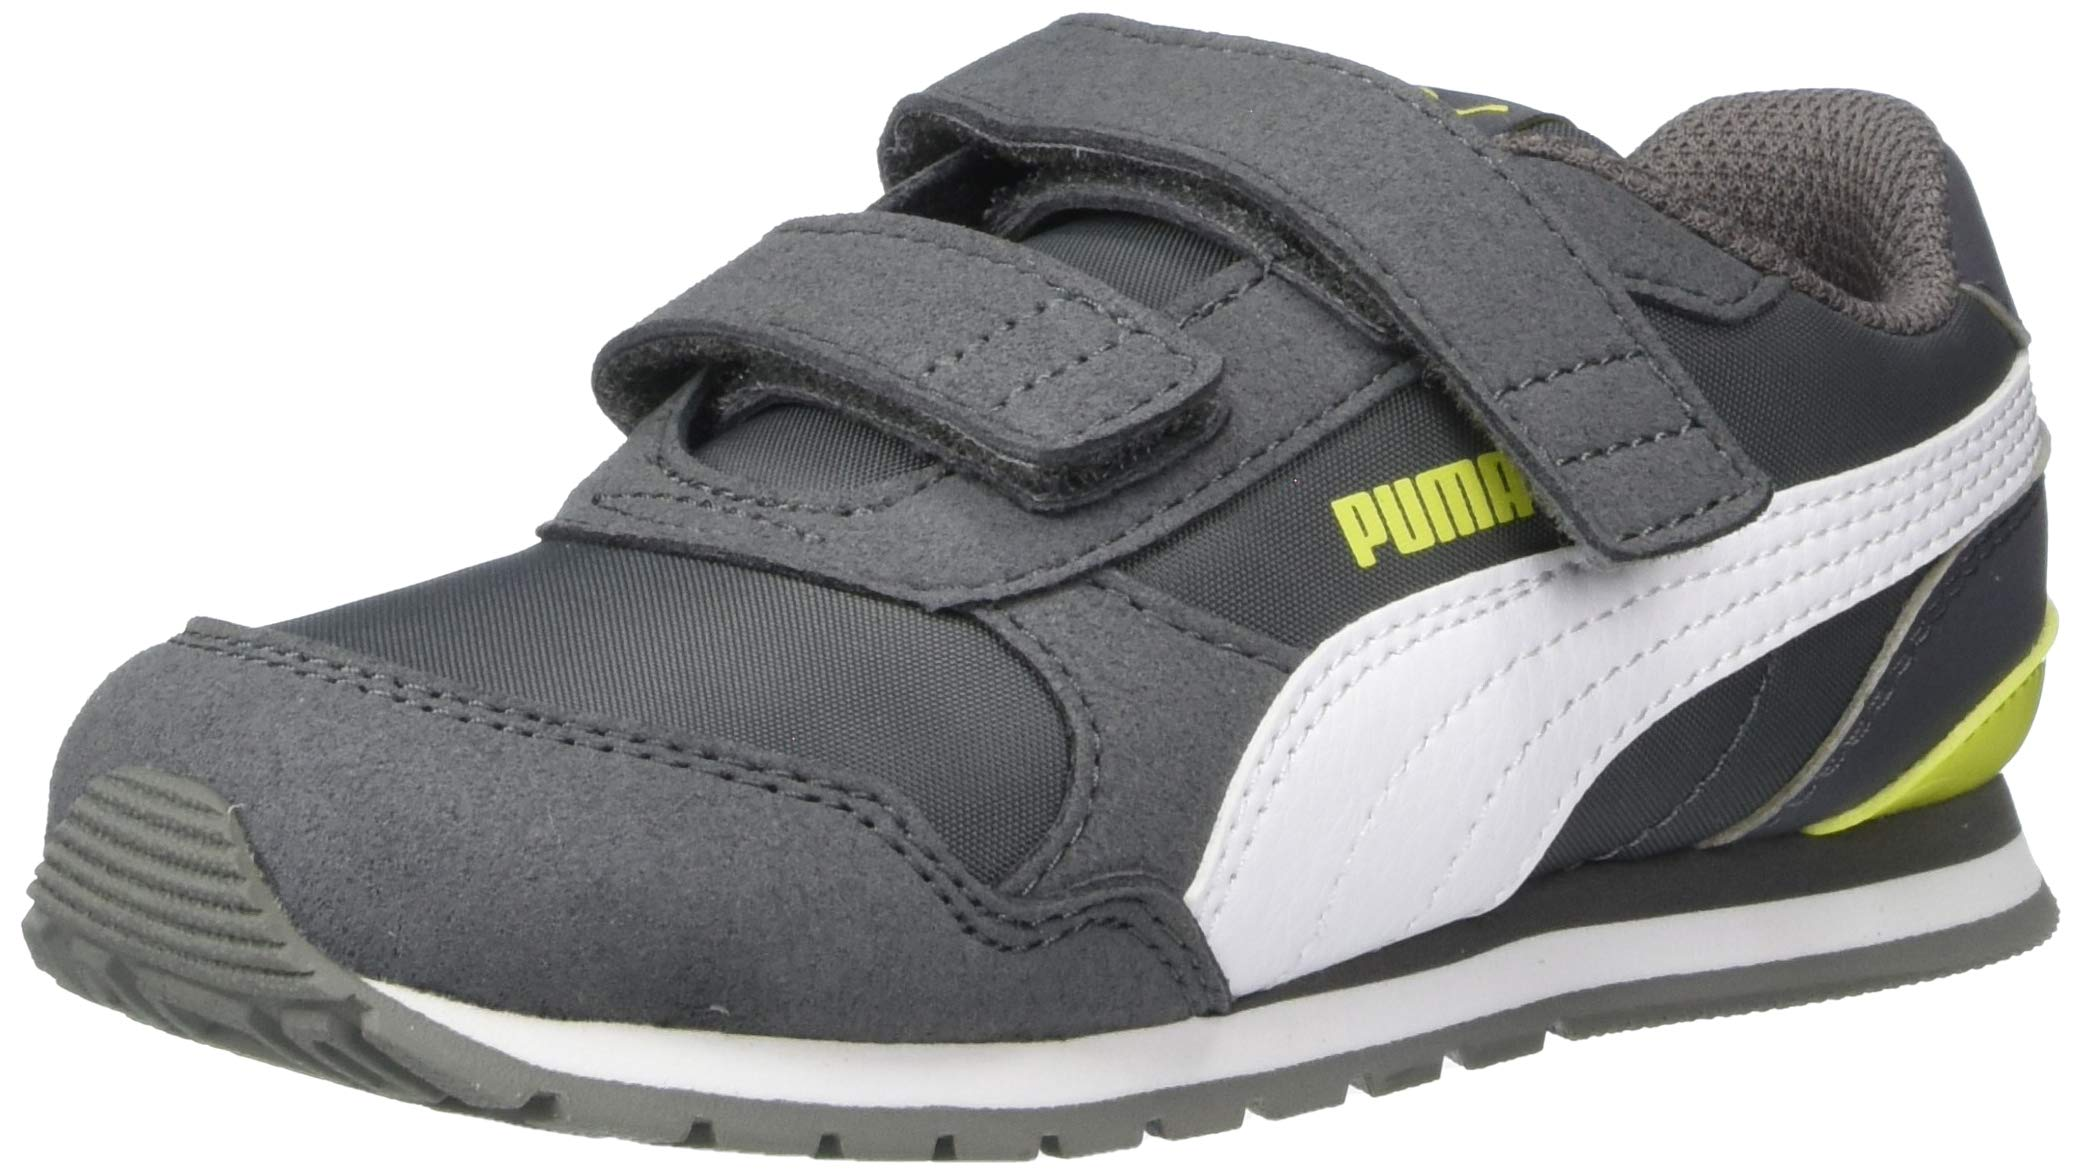 PUMA Baby ST Runner Velcro Sneaker, Castlerock White-Nrgy Yellow, 8 M US Toddler by PUMA